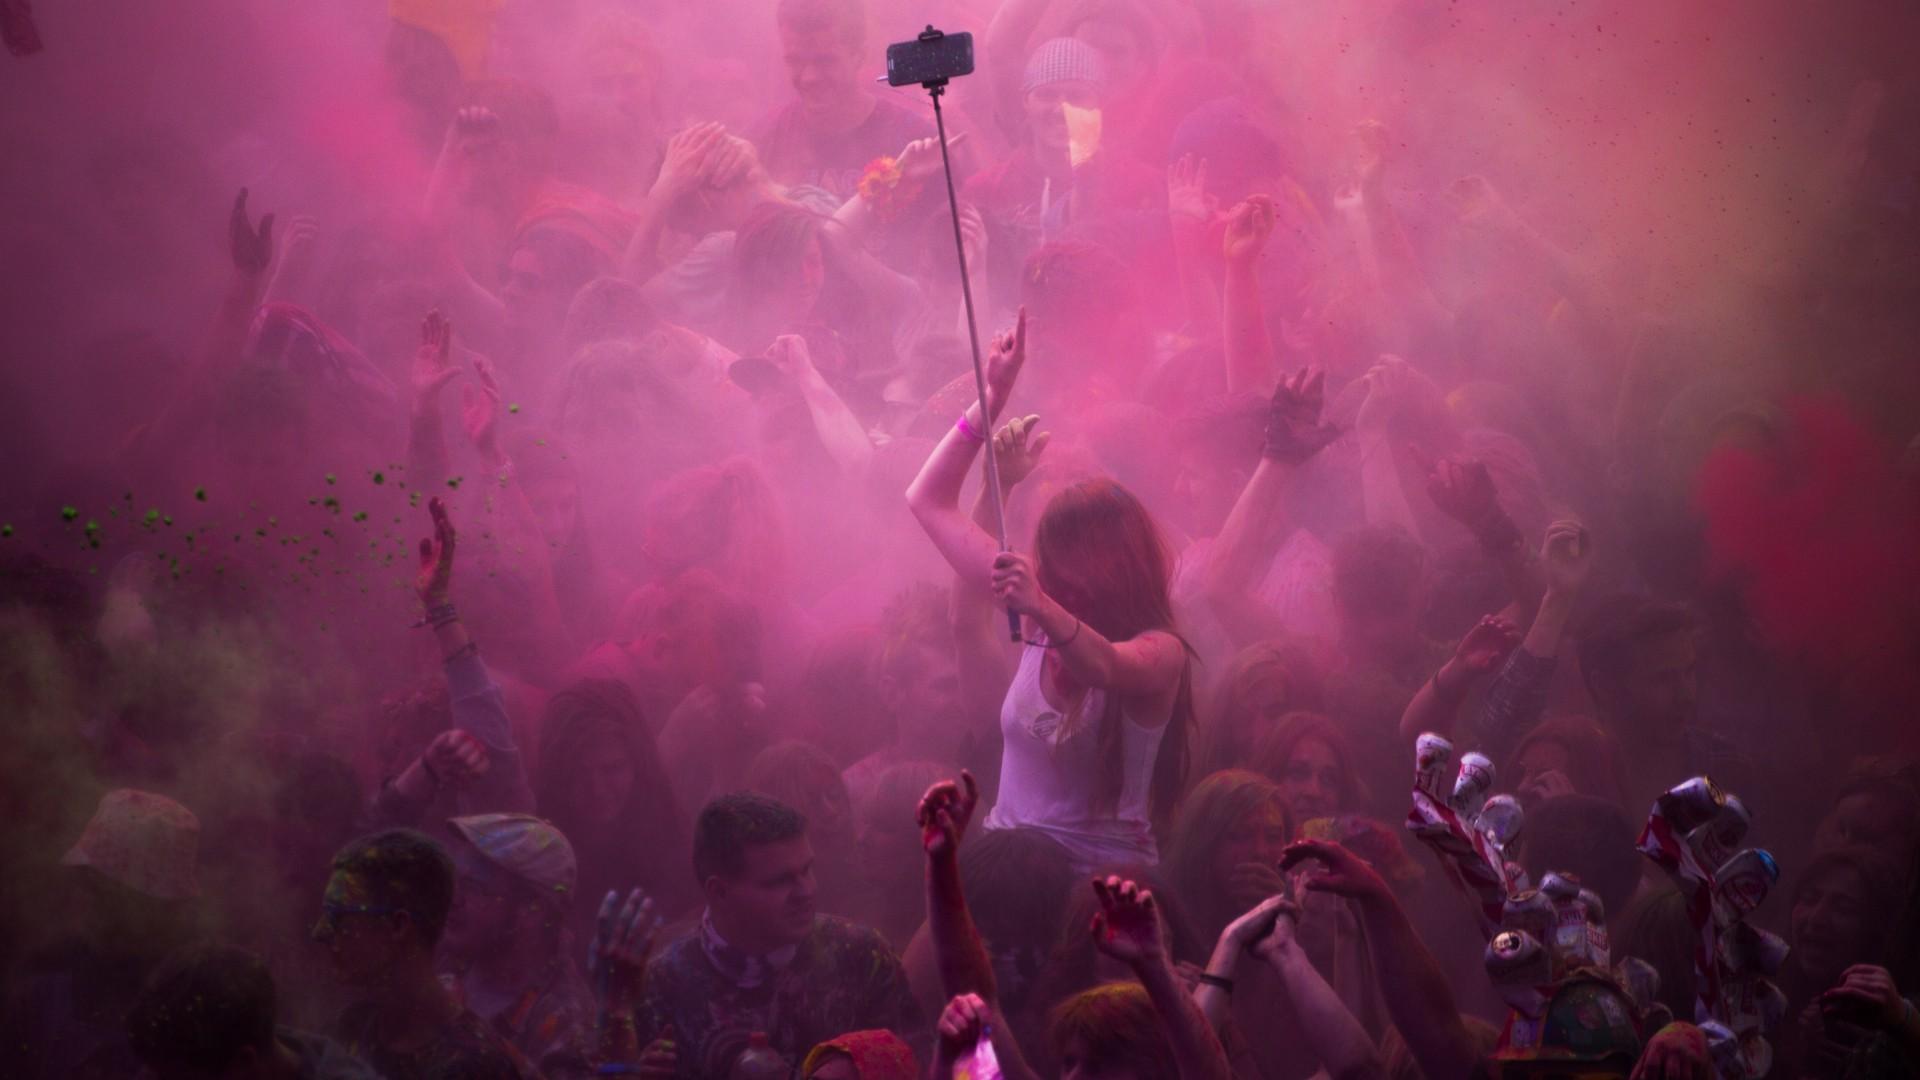 Lucyna_Lewandowska_Woodstock_publicznosc